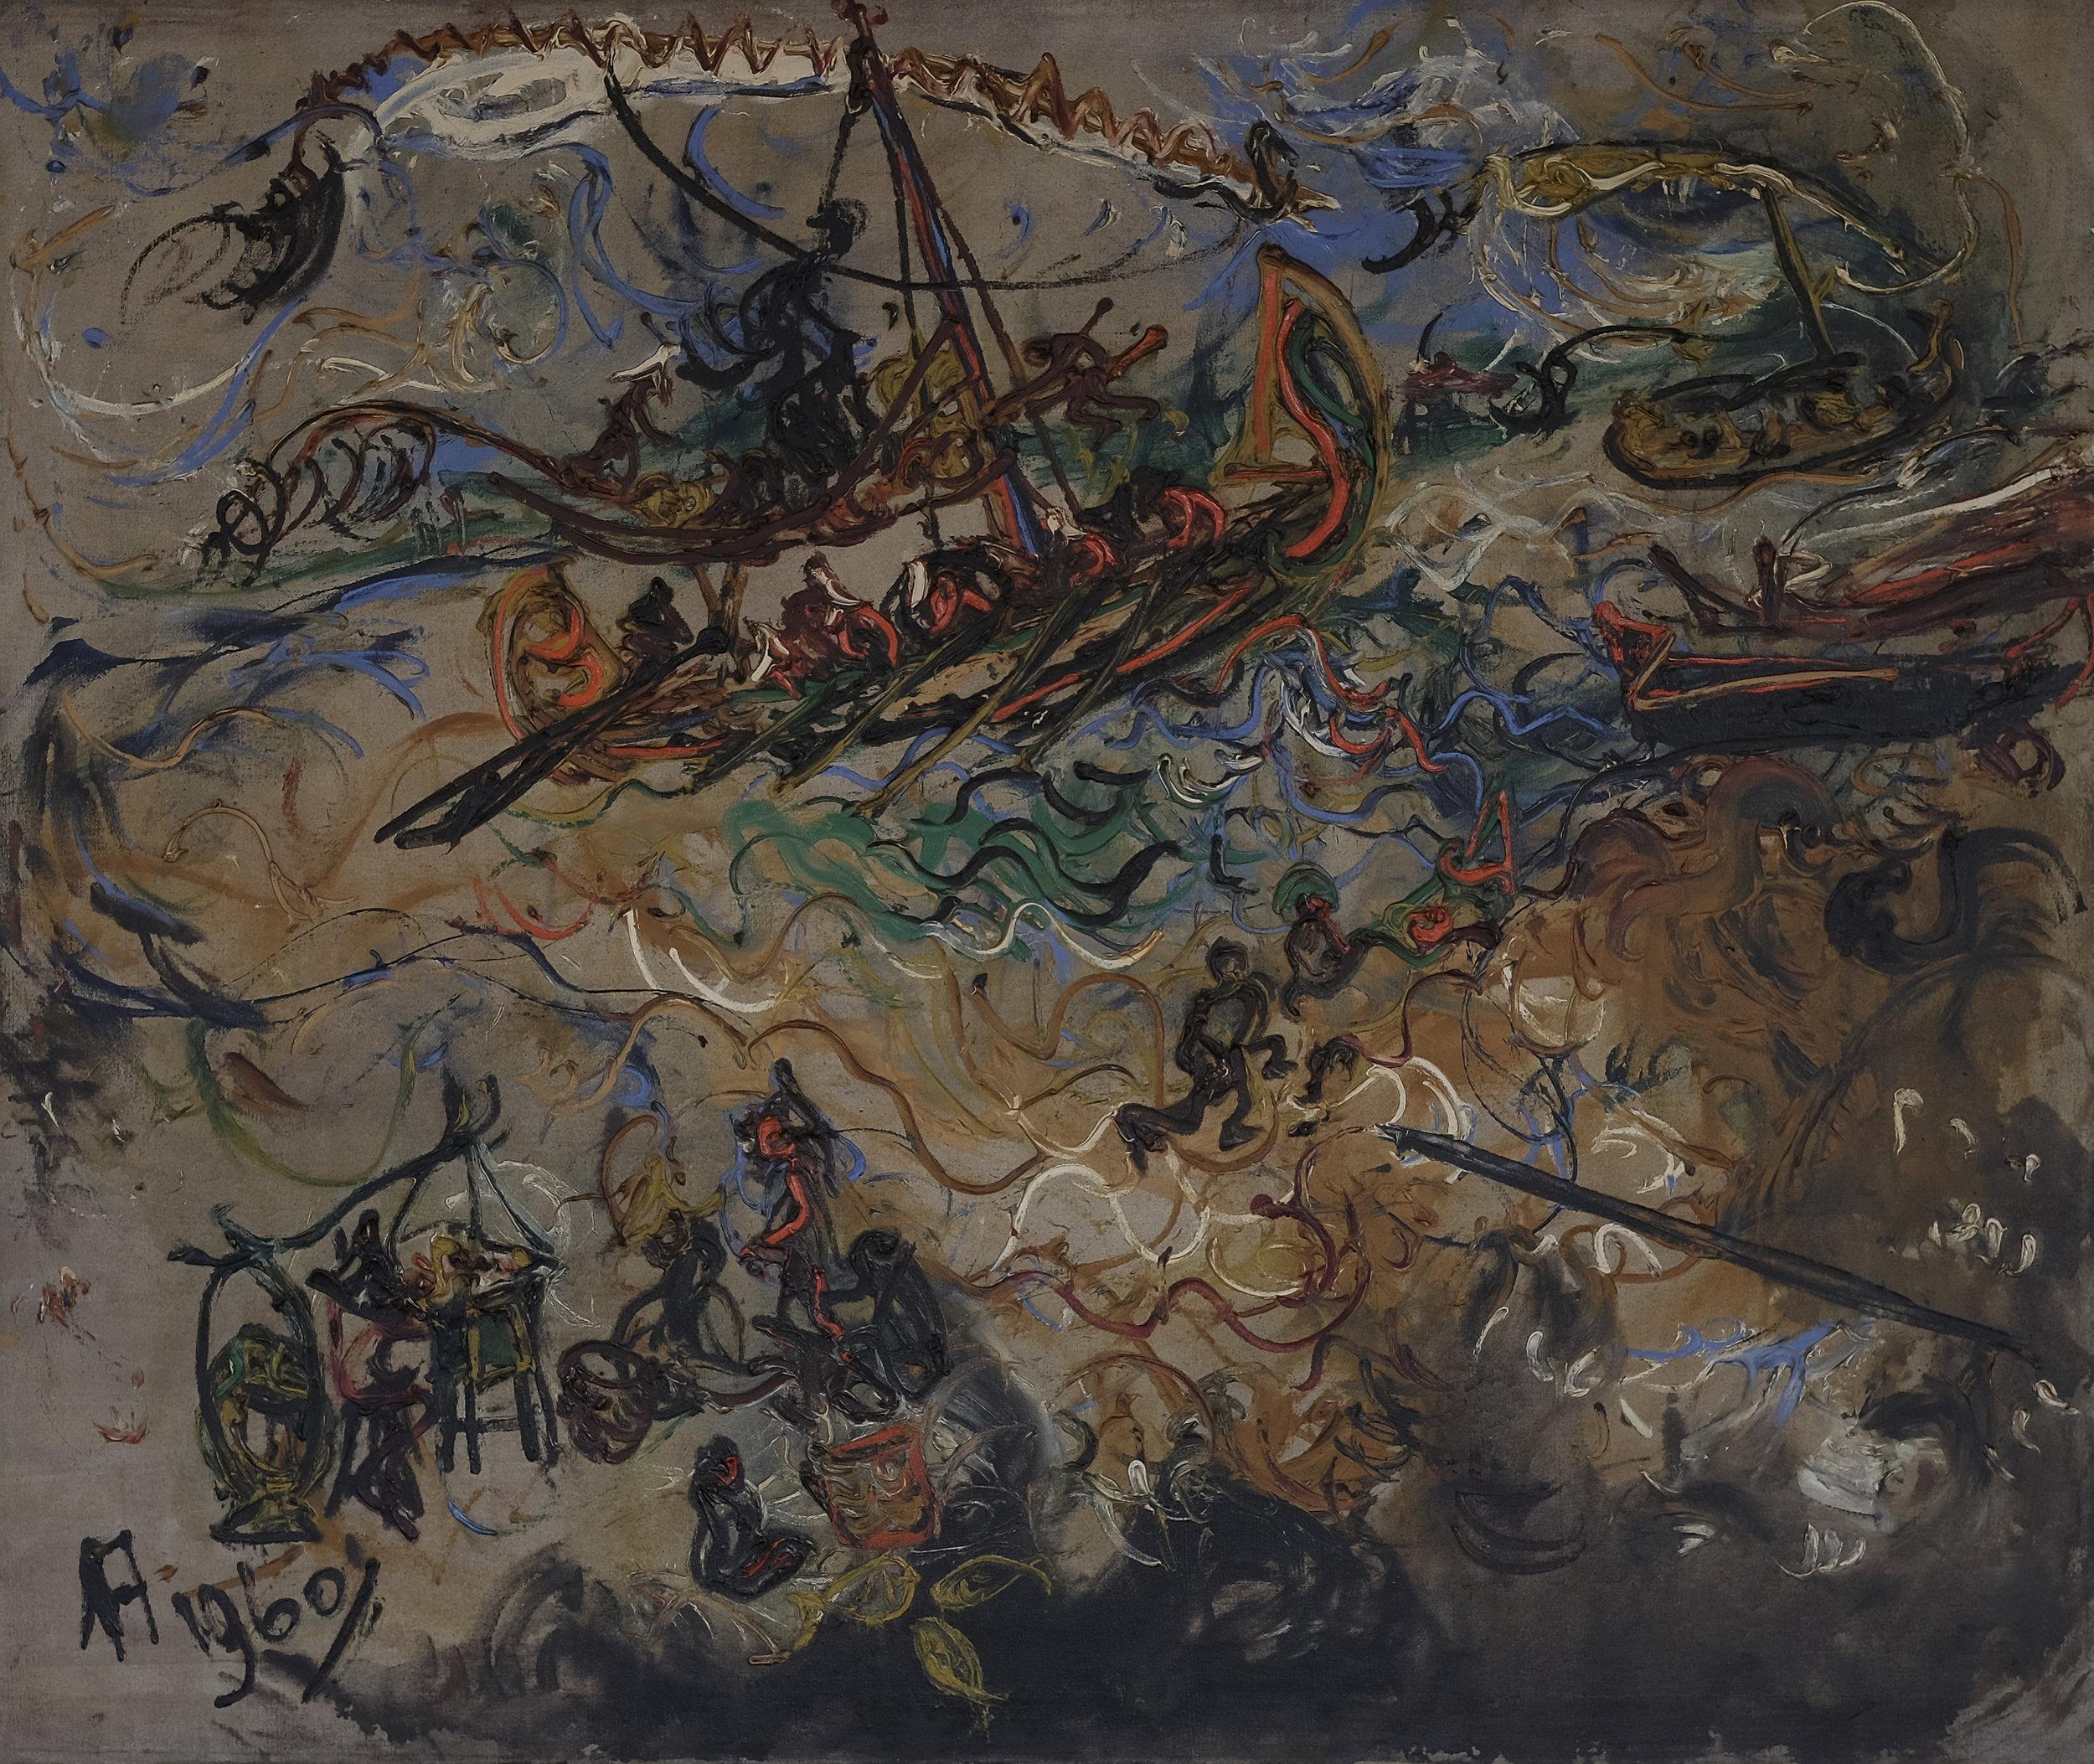 Affandi, Pemandangan Laut Jawa (Seascape of the Java Sea), oil on canvas, 104 x 124 cm, 1960